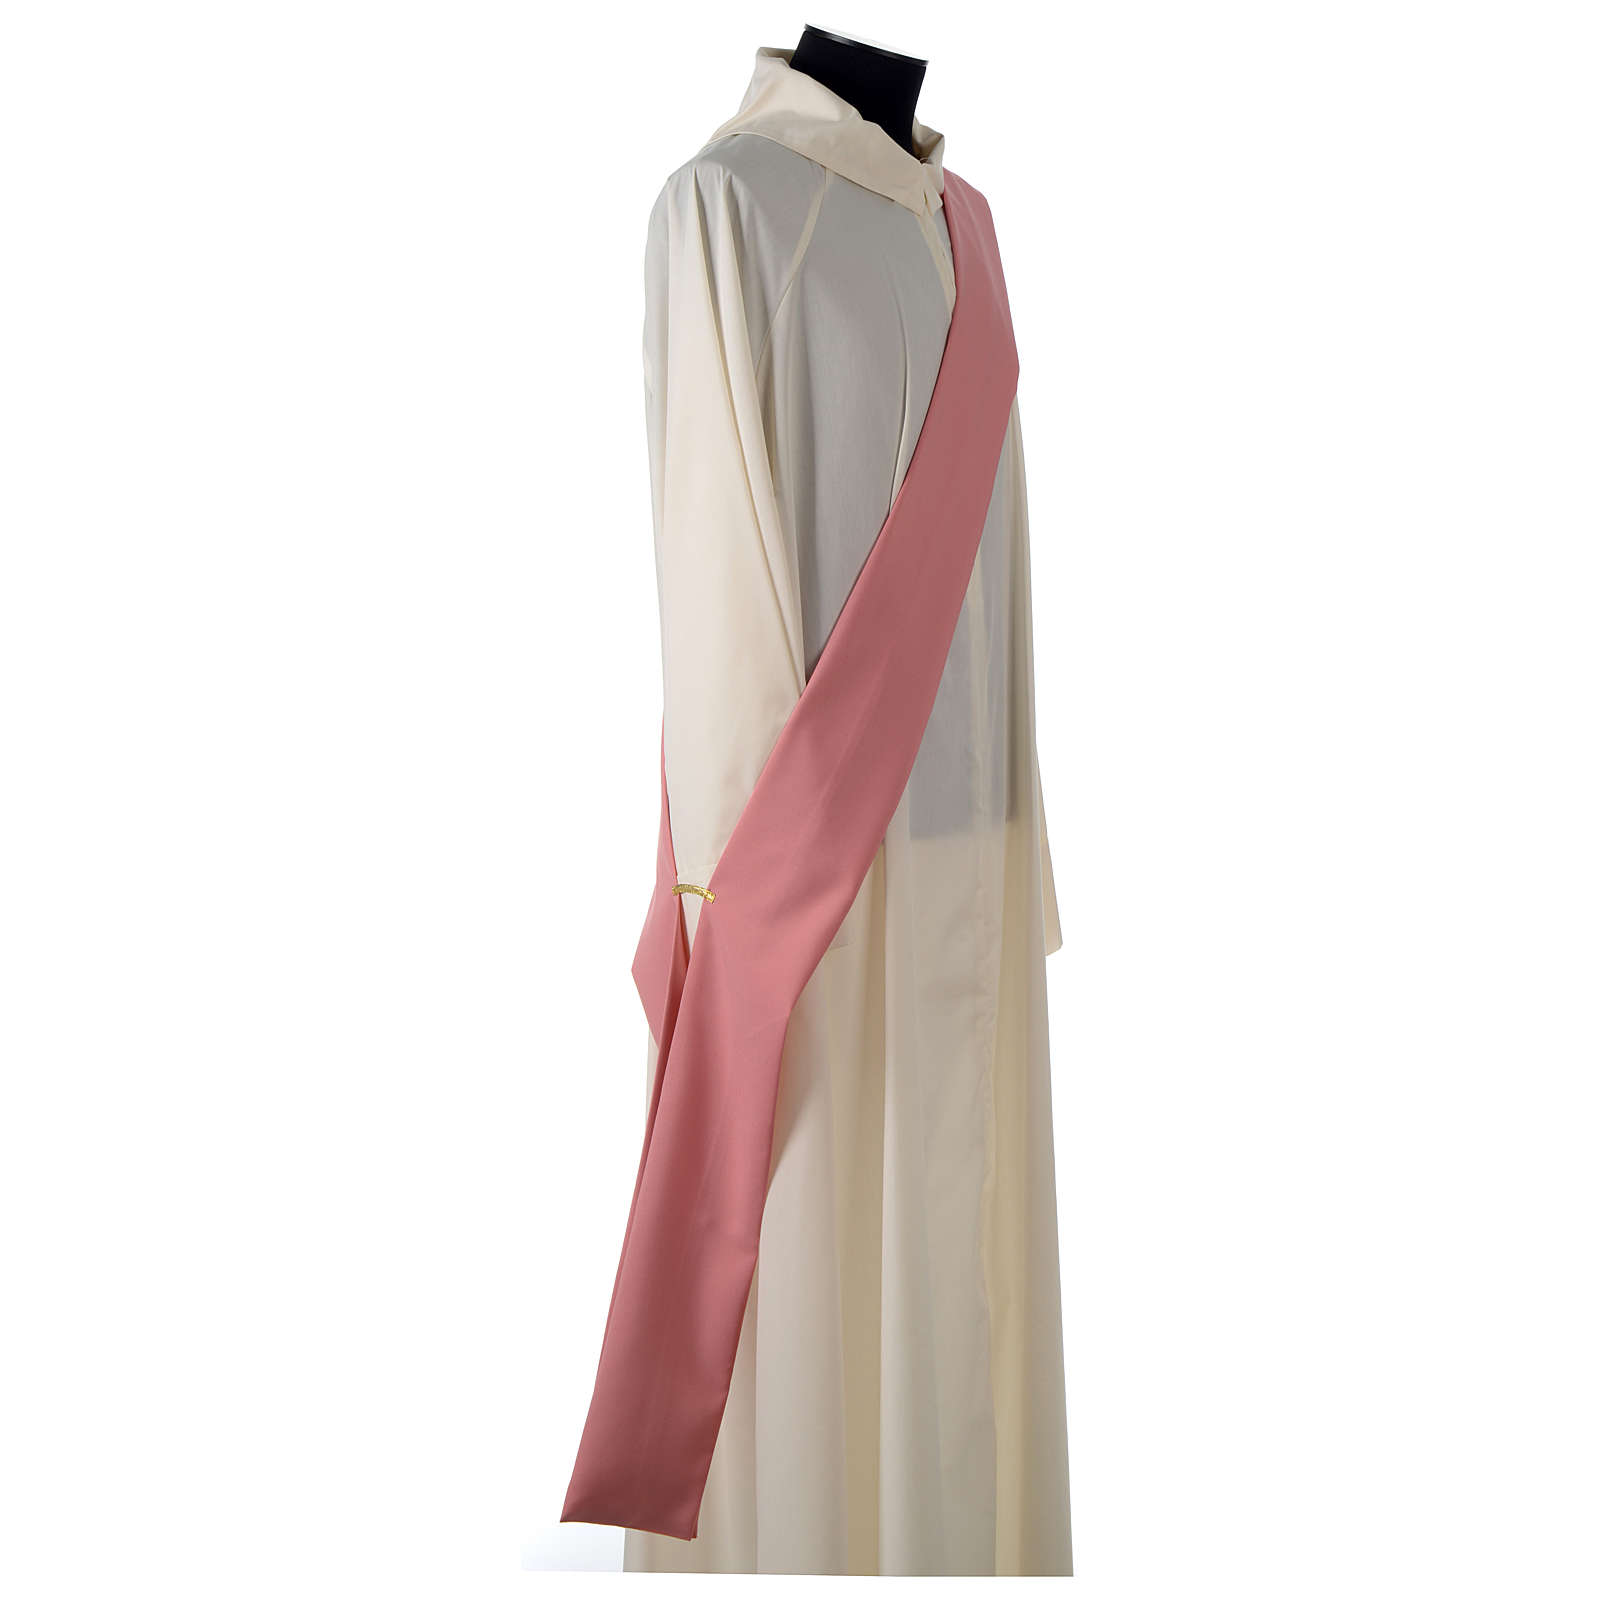 Dalmática rosa entorchado aplicado parte anterior tejido Vatican poliéster 4